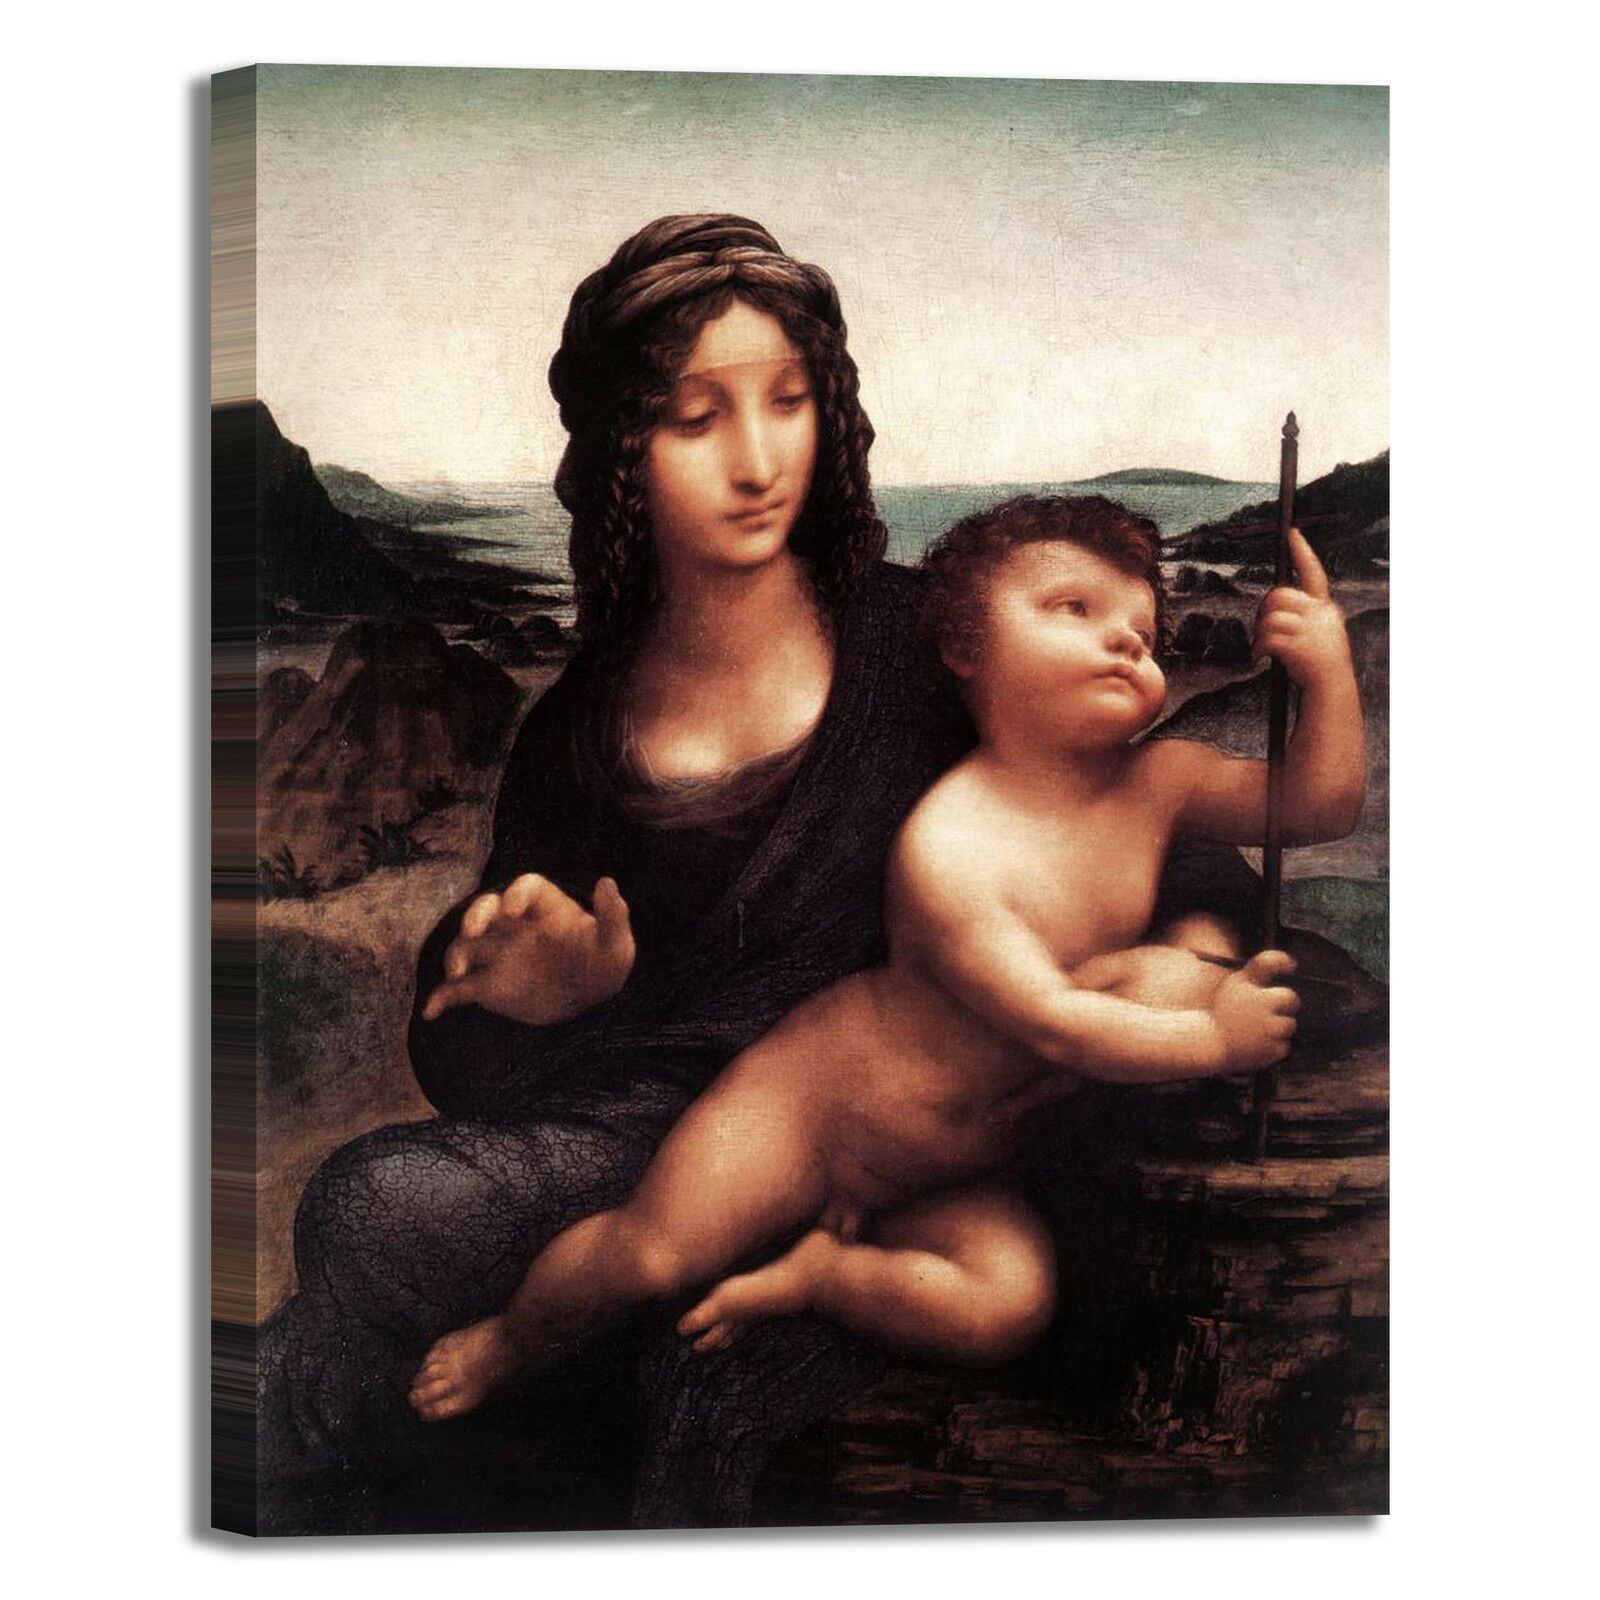 Da Vinci Madonna dei Fusi design quadro stampa tela dipinto telaio arrossoo casa